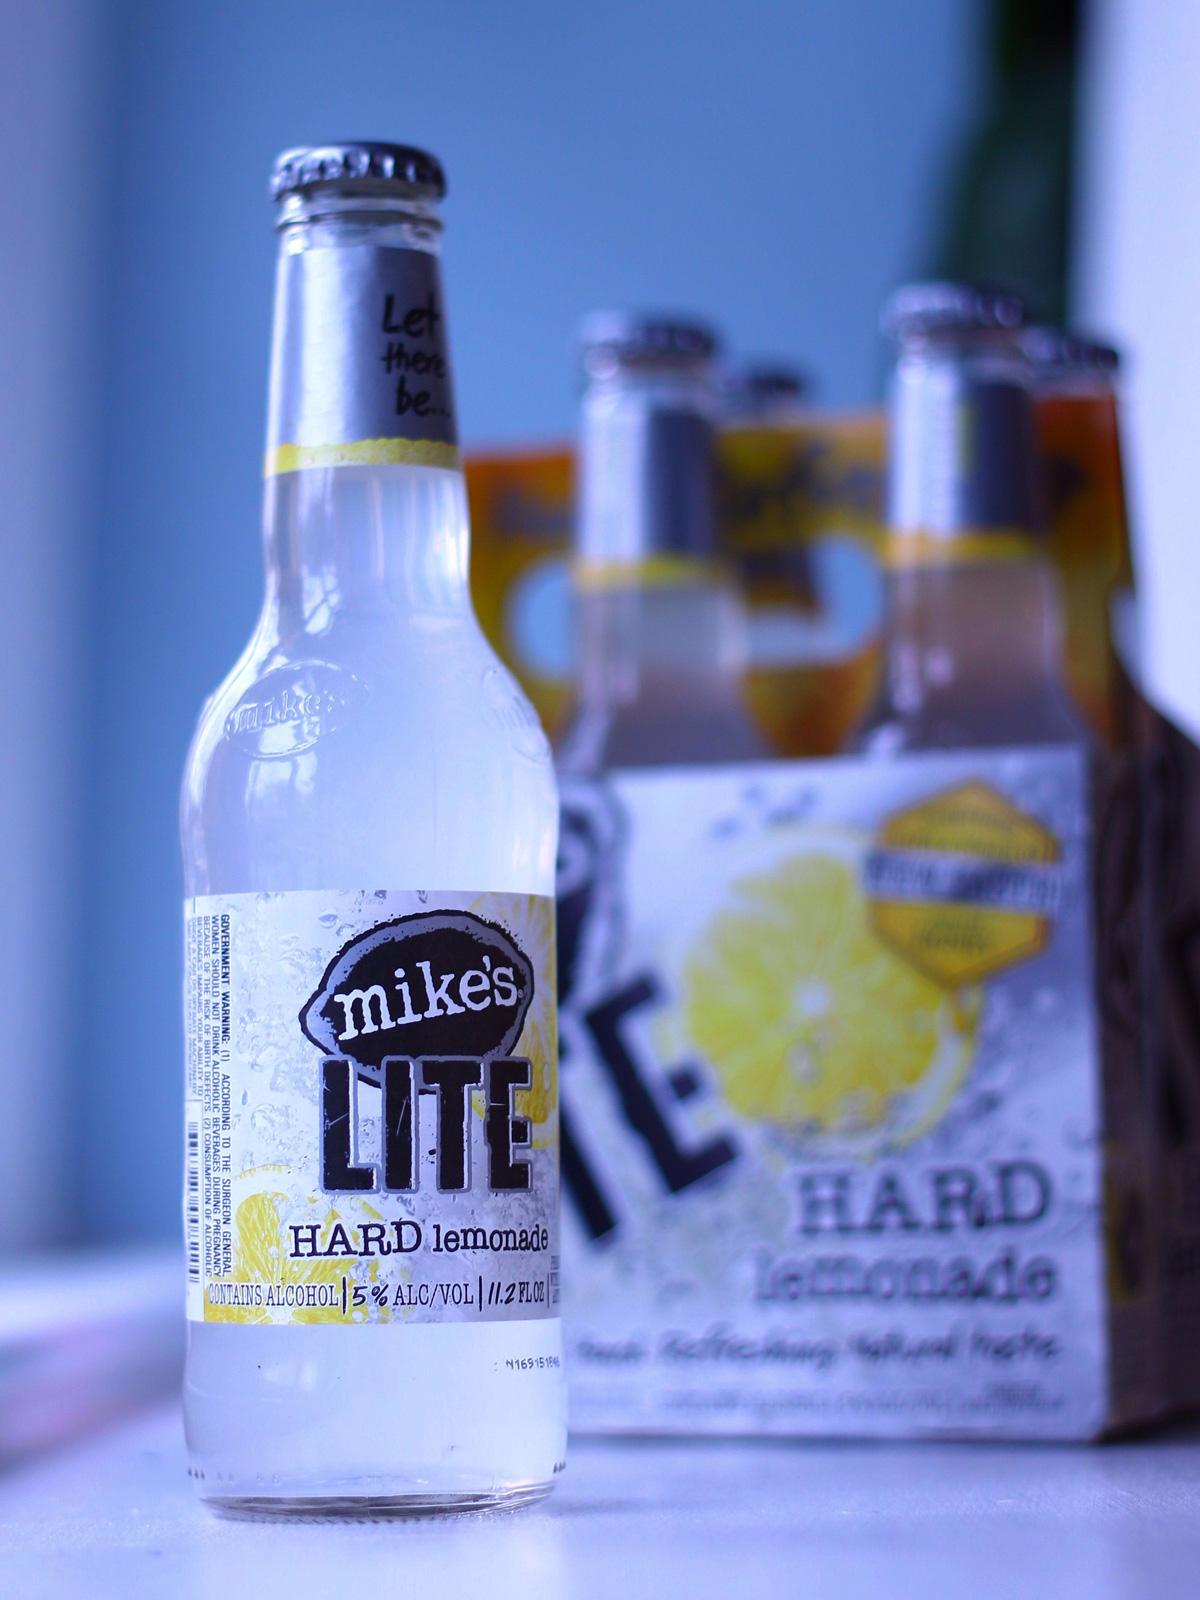 Mike's Lite Hard Lemonade